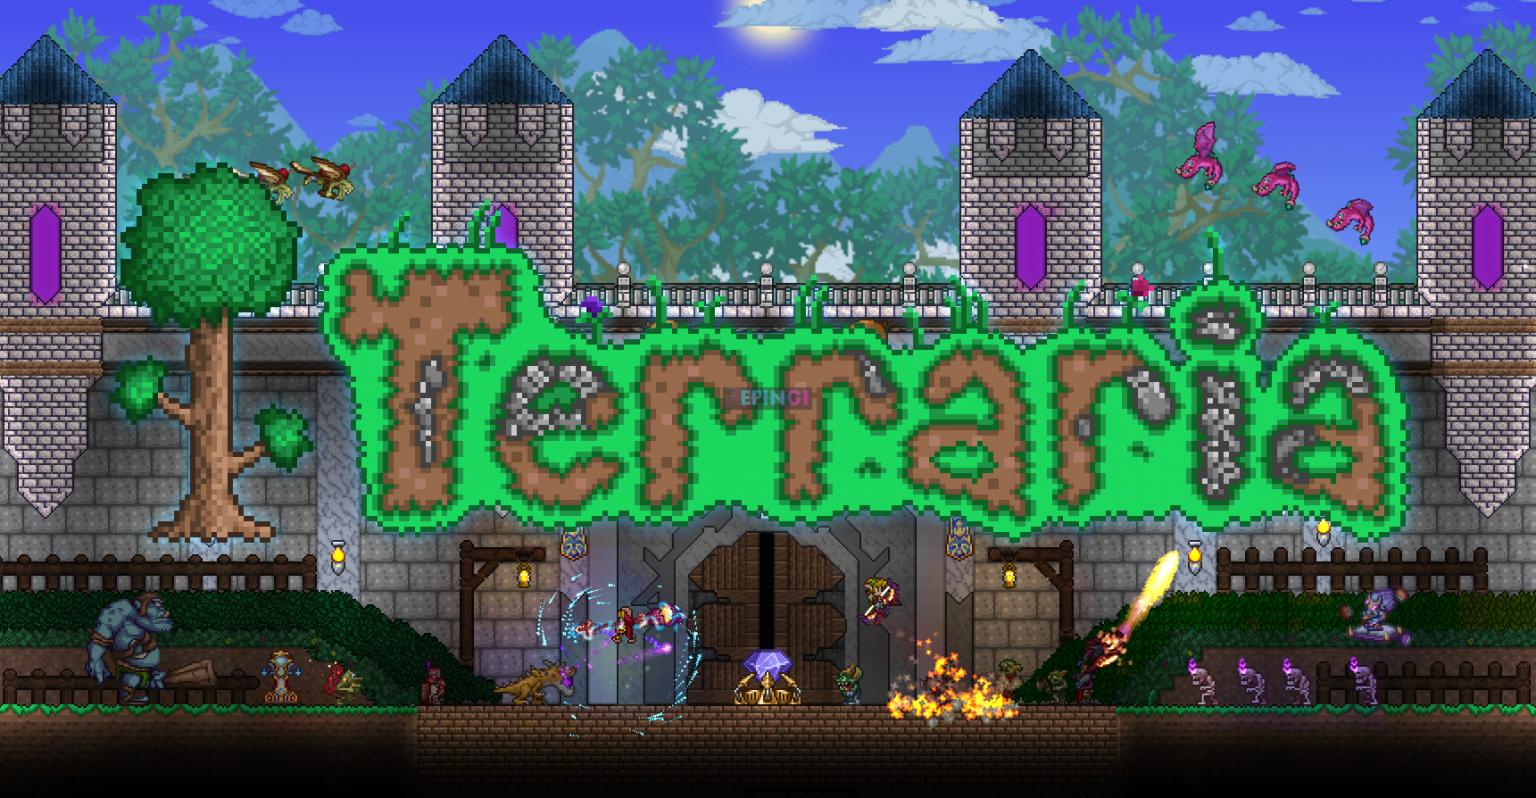 Terraria PC Game Download Full Version